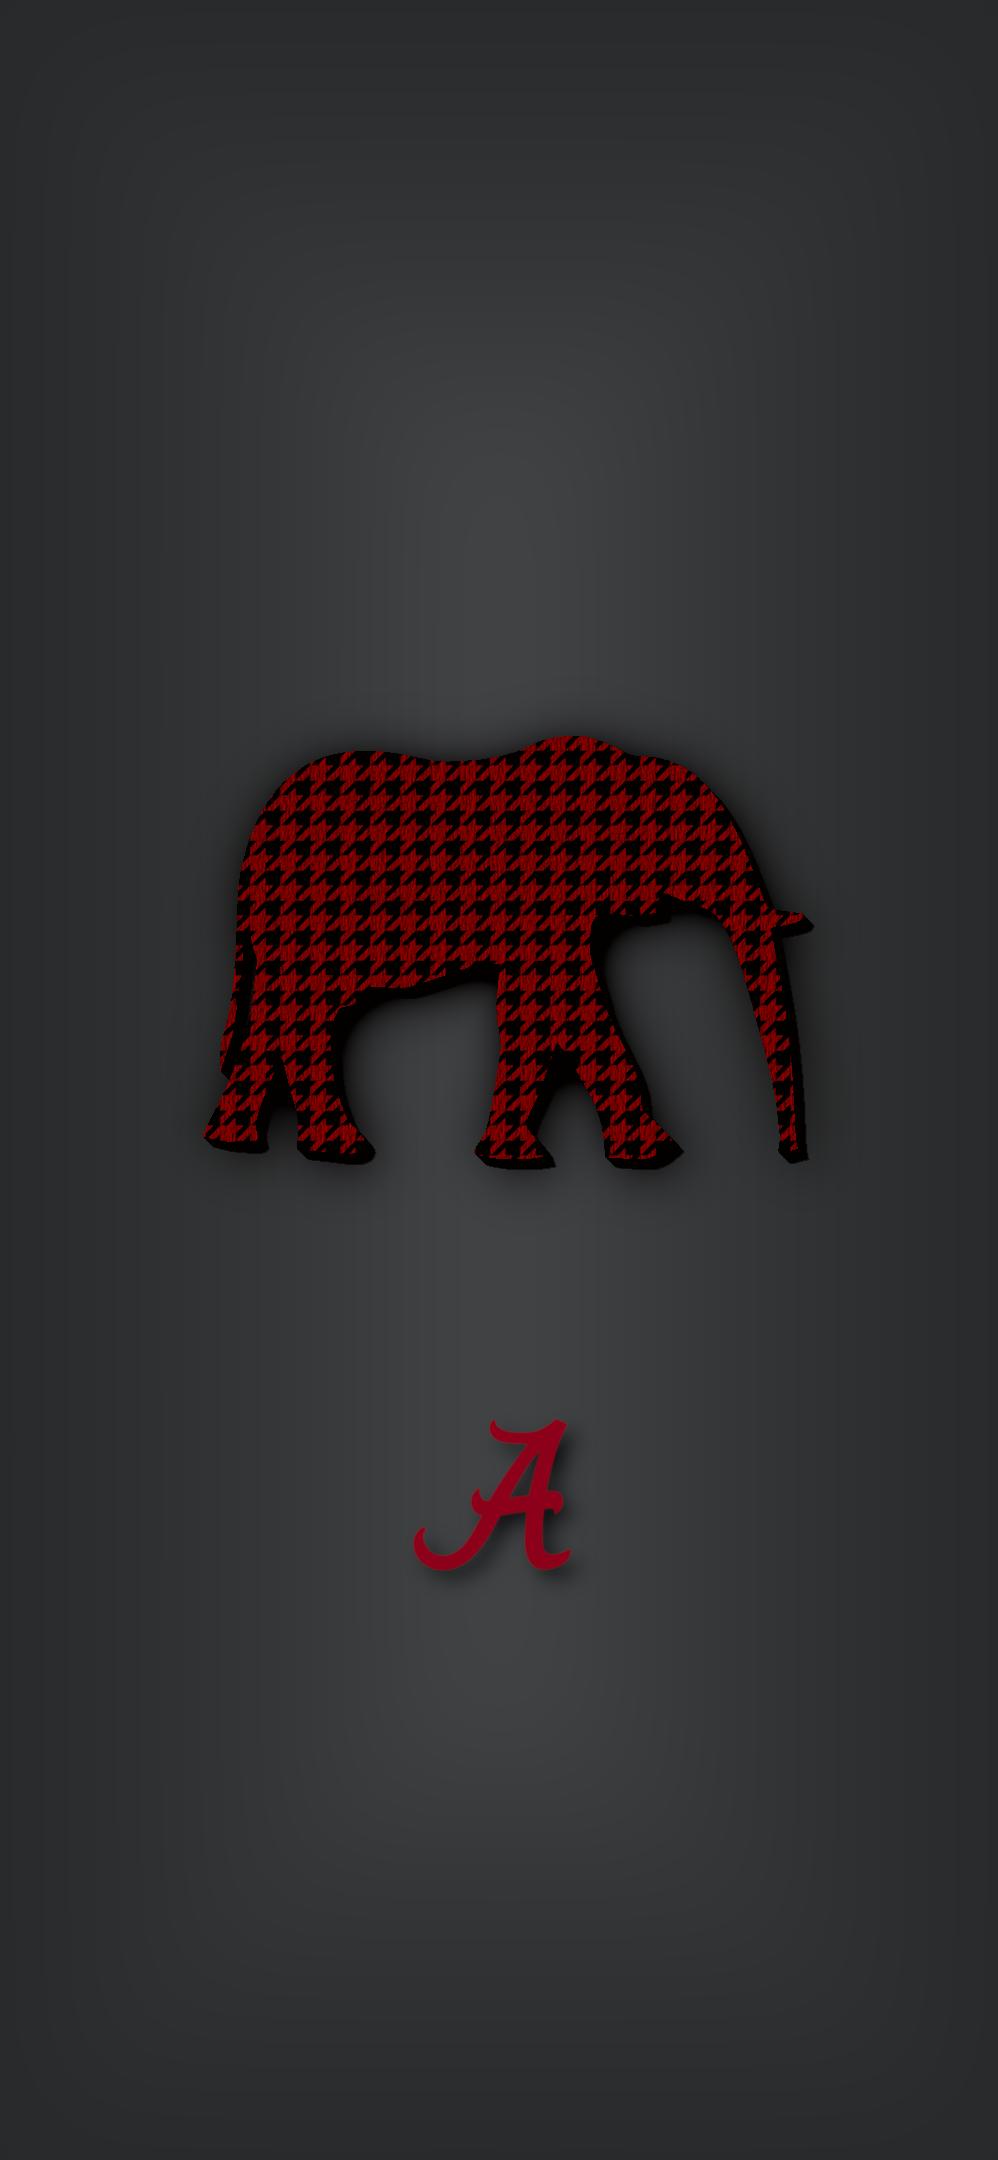 Ht Elephant 2 Alabama Crimson Tide Football Alabama Crimson Tide Crimson Tide Football